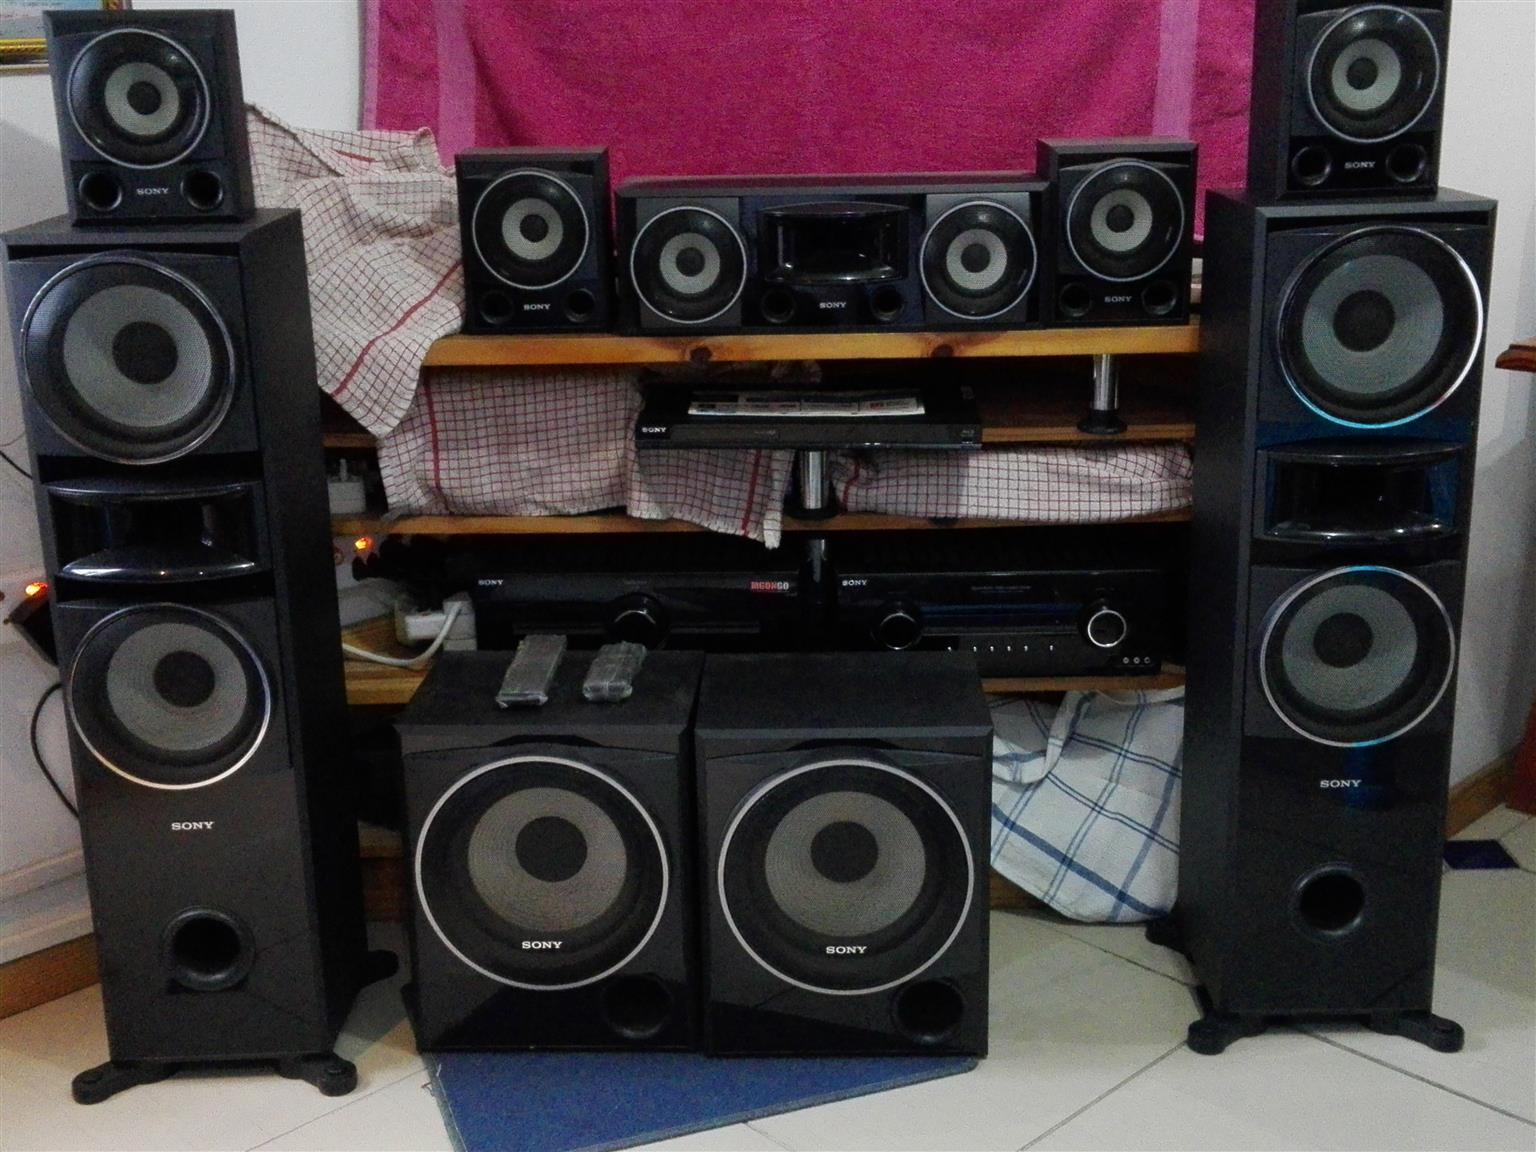 sony 7 2 surround sound system junk mail. Black Bedroom Furniture Sets. Home Design Ideas